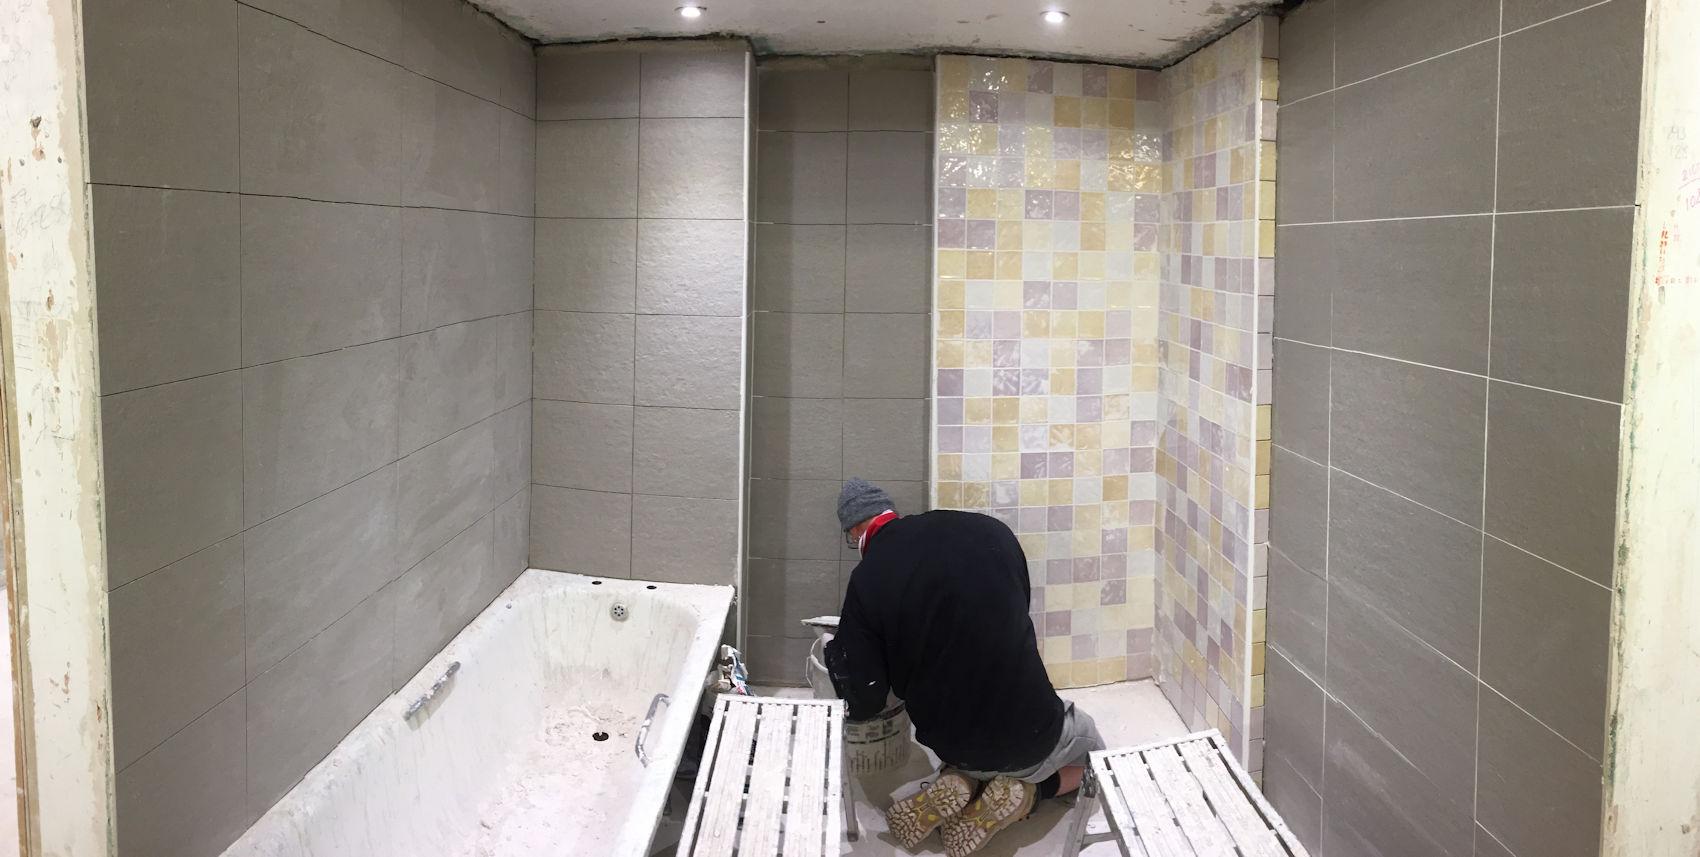 Tiling courses